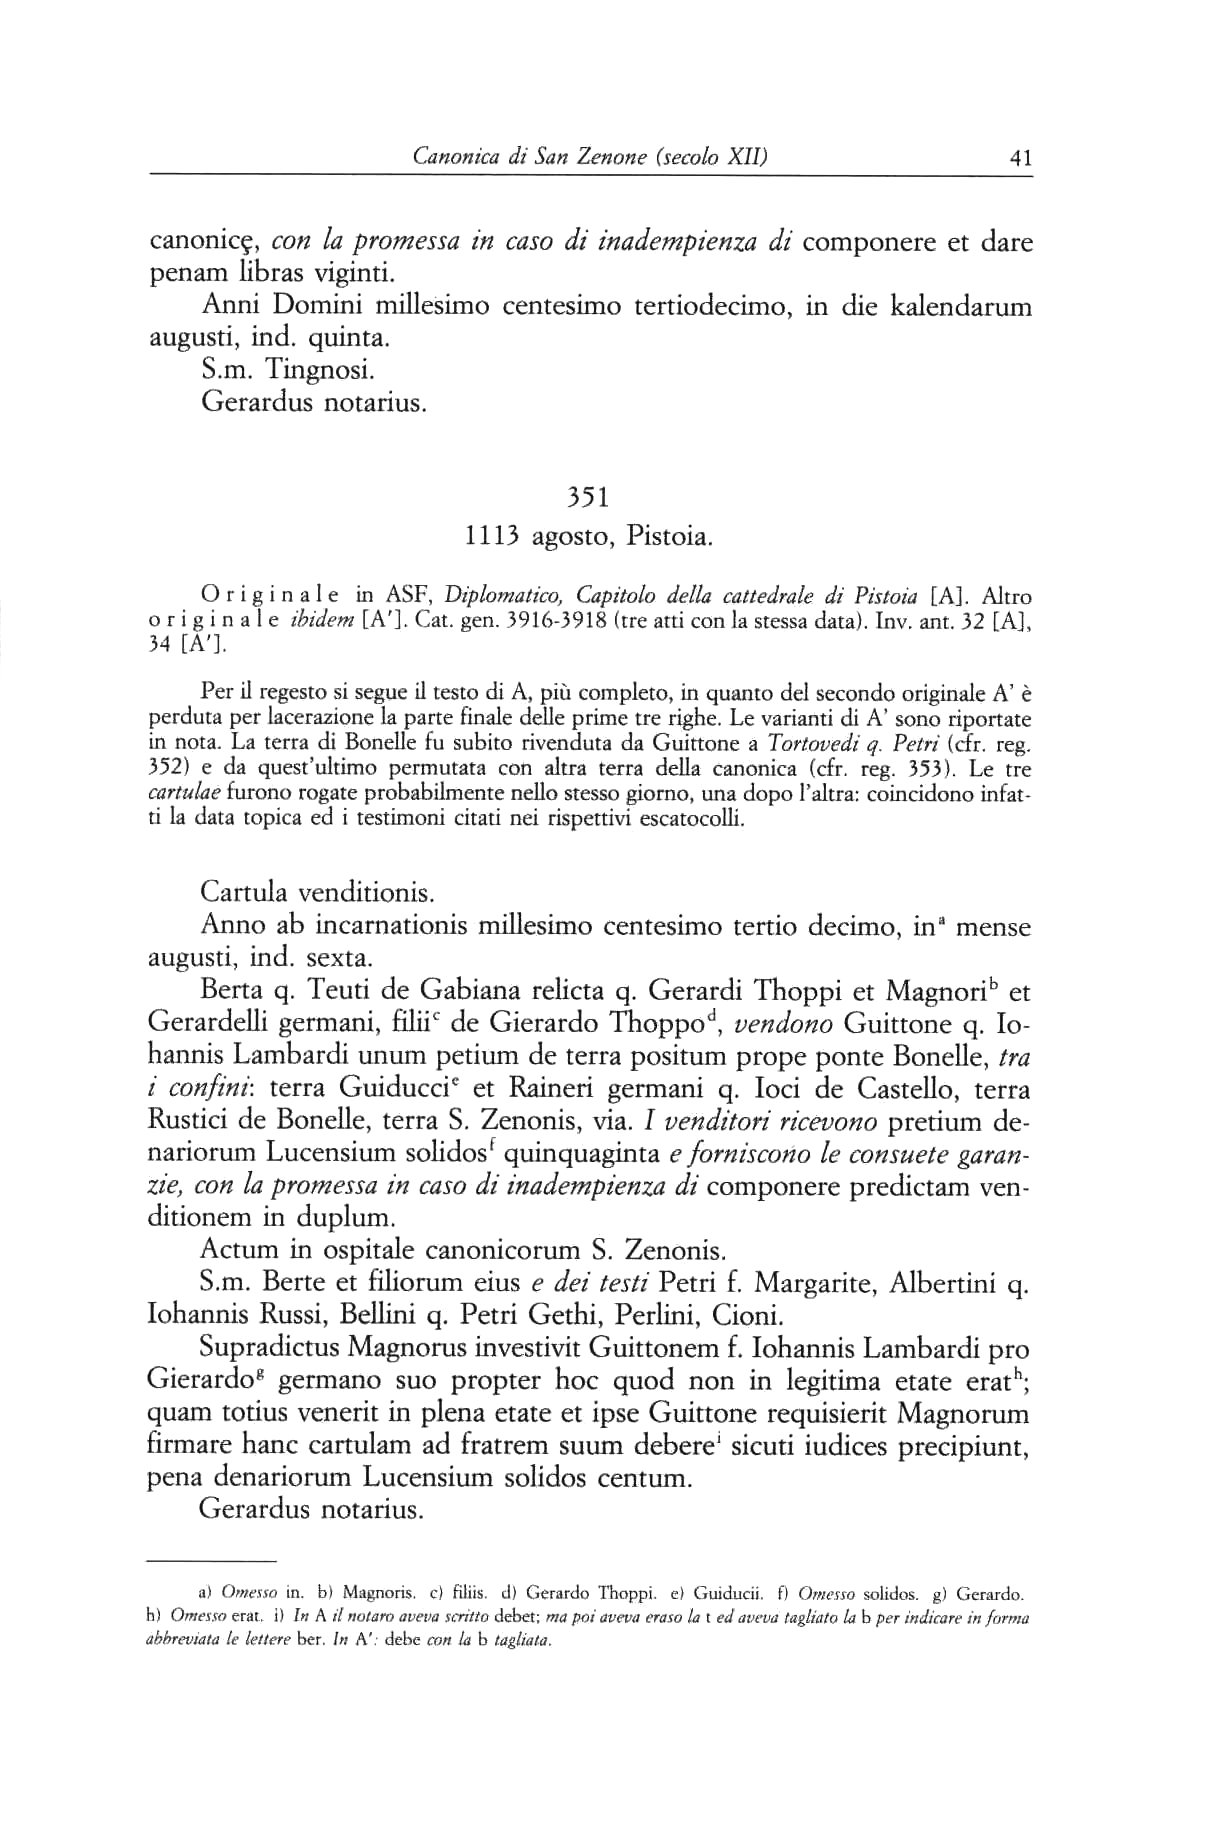 Canonica S. Zenone XII 0041.jpg